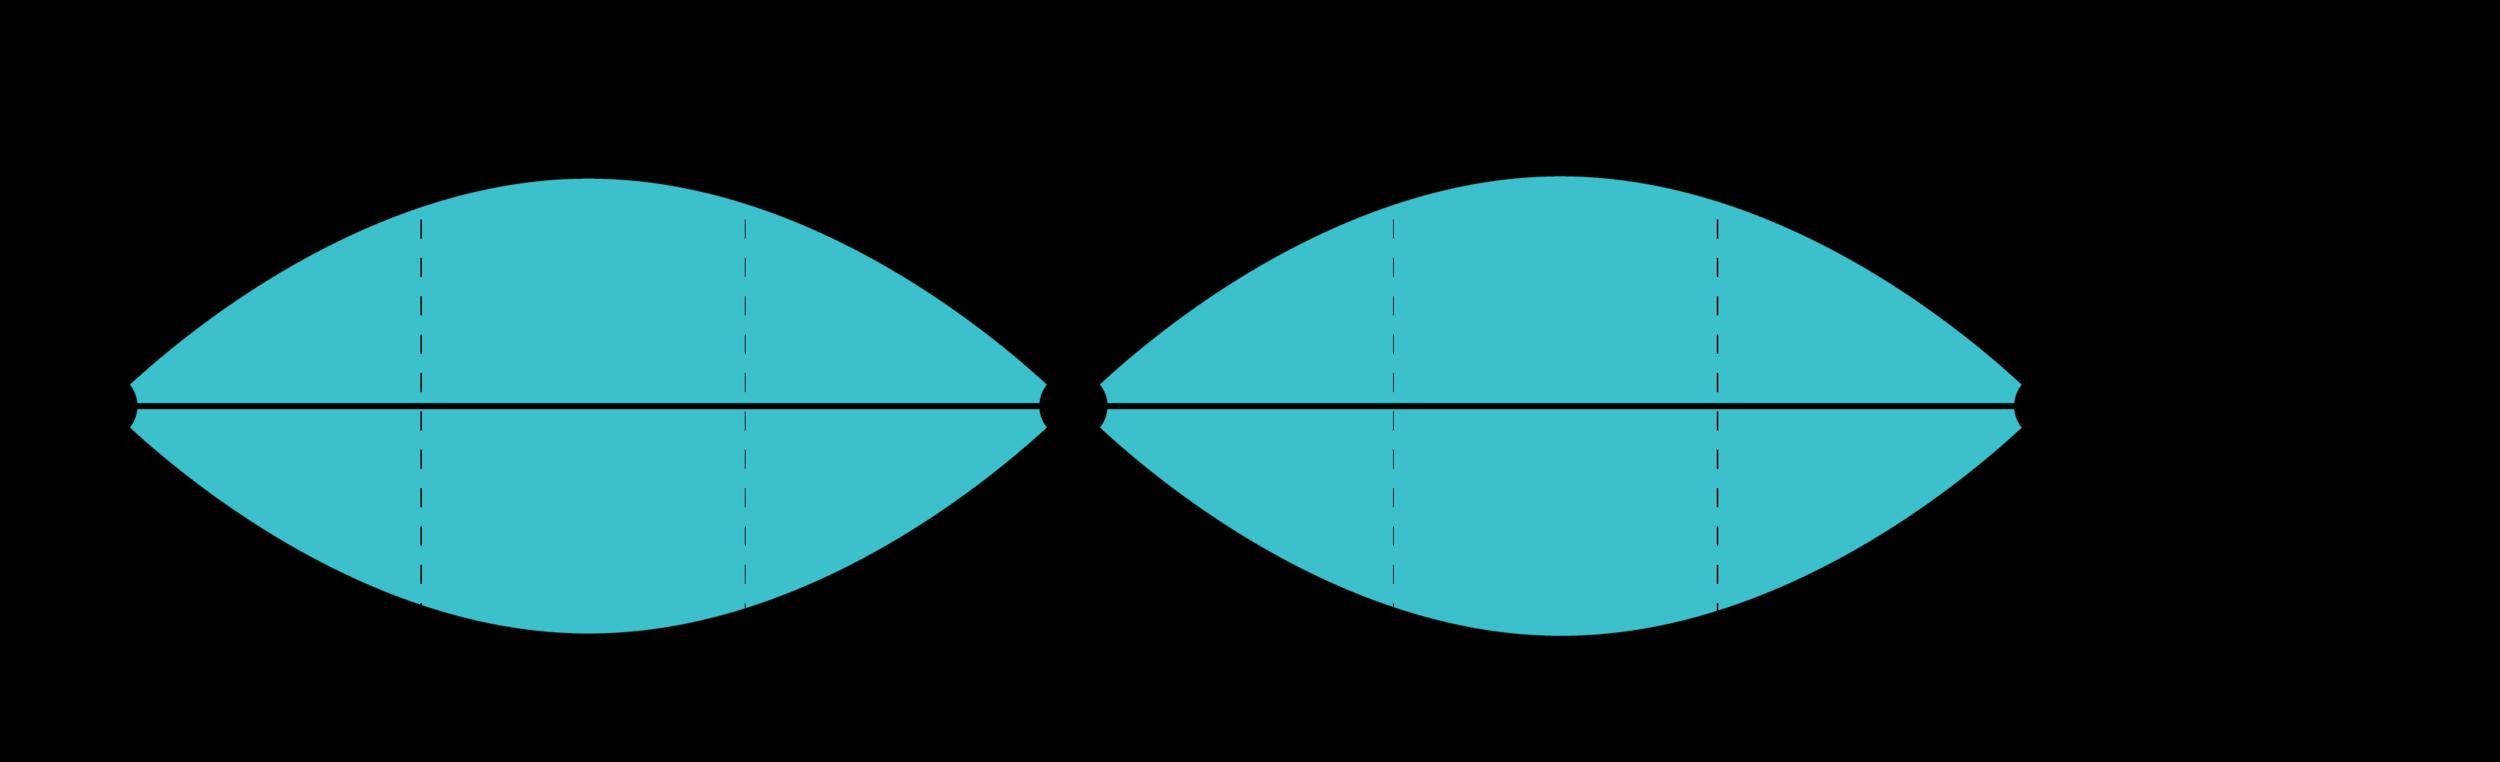 Figure      SEQ Figure \* ARABIC    2      : FromHereOn Realisation Pattern